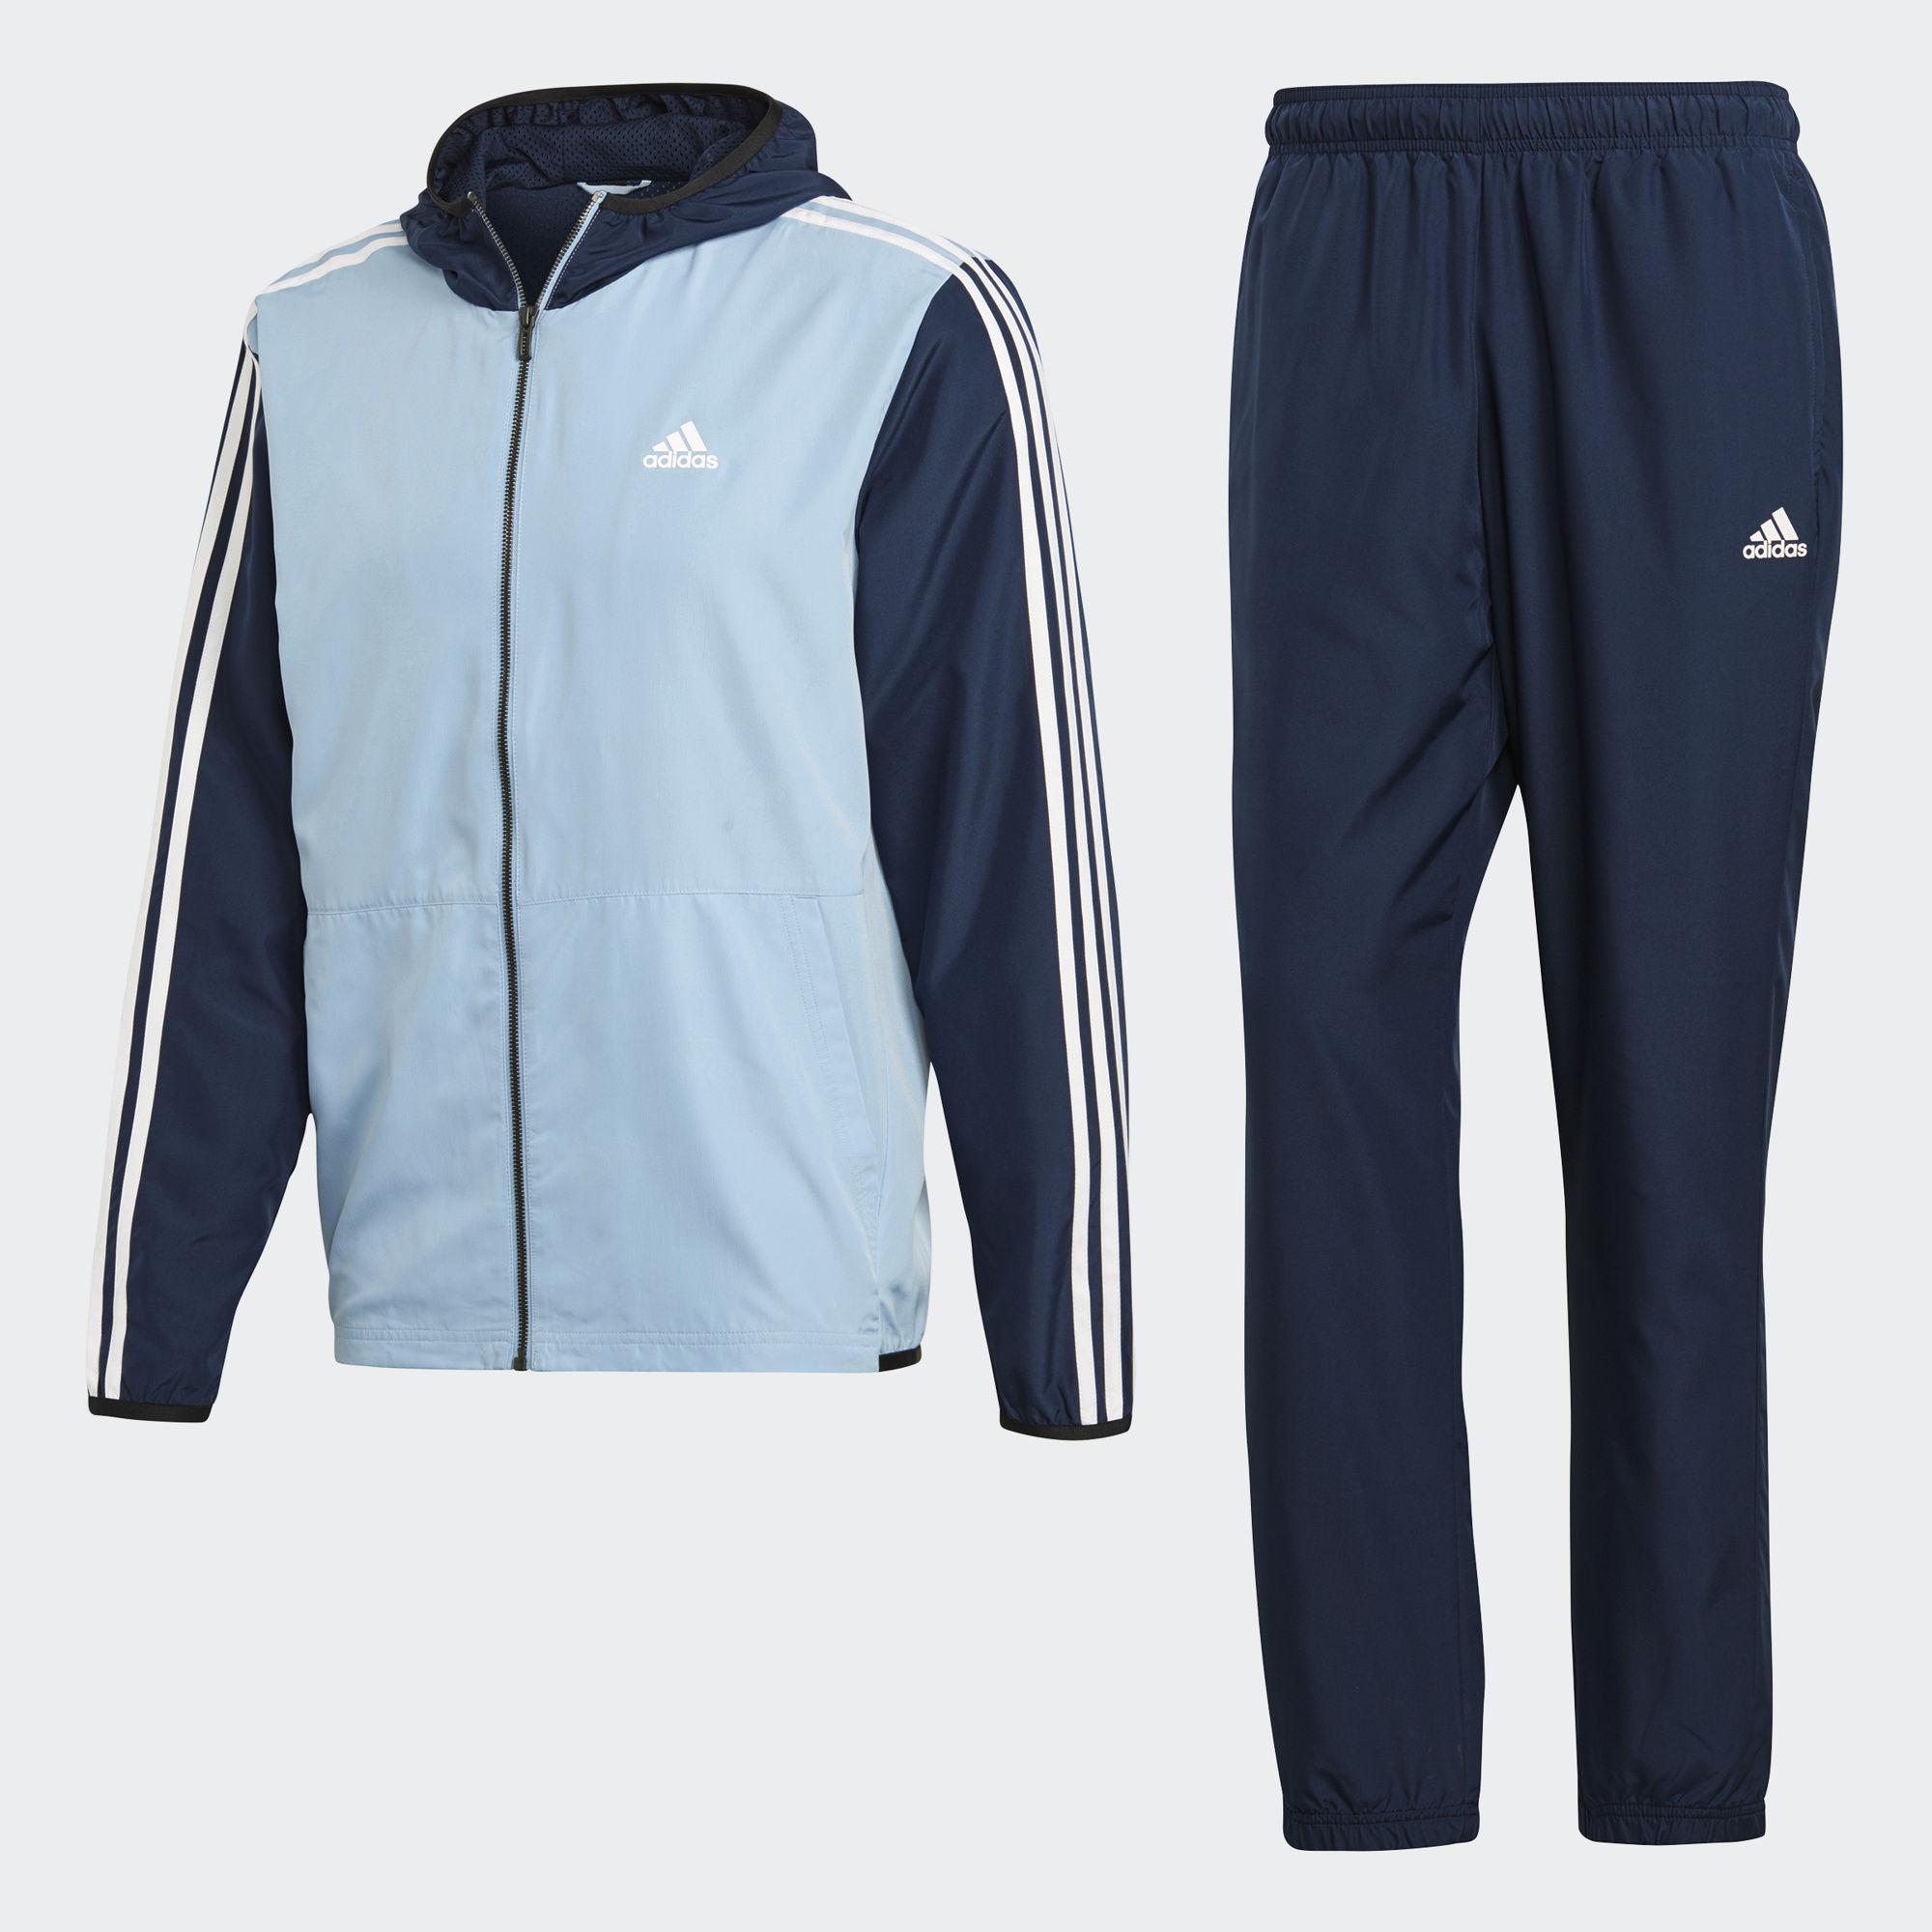 Спортивный костюм мужской adidas Mts Wv Pride, цвет: синий. CD6368. Размер 6 (50) спортивный костюм для девочки adidas yg hood pes ts цвет розовый темно синий bs2151 размер 116